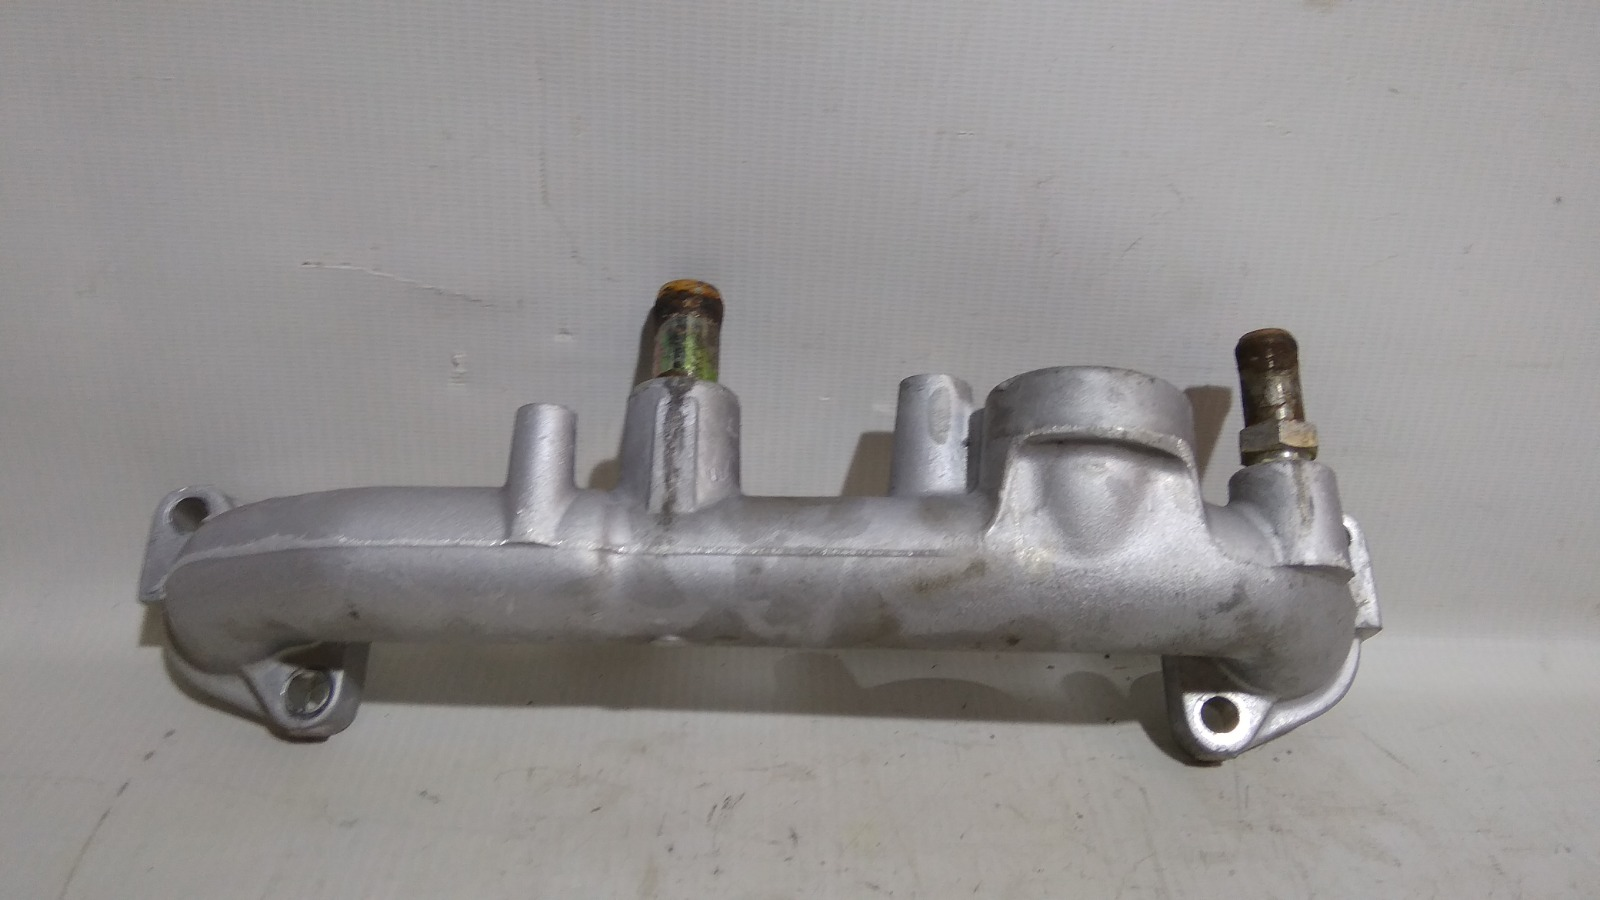 Трубка охлажд. жидкости металлическая Mitsubishi Challenger K99W 6G74 1997